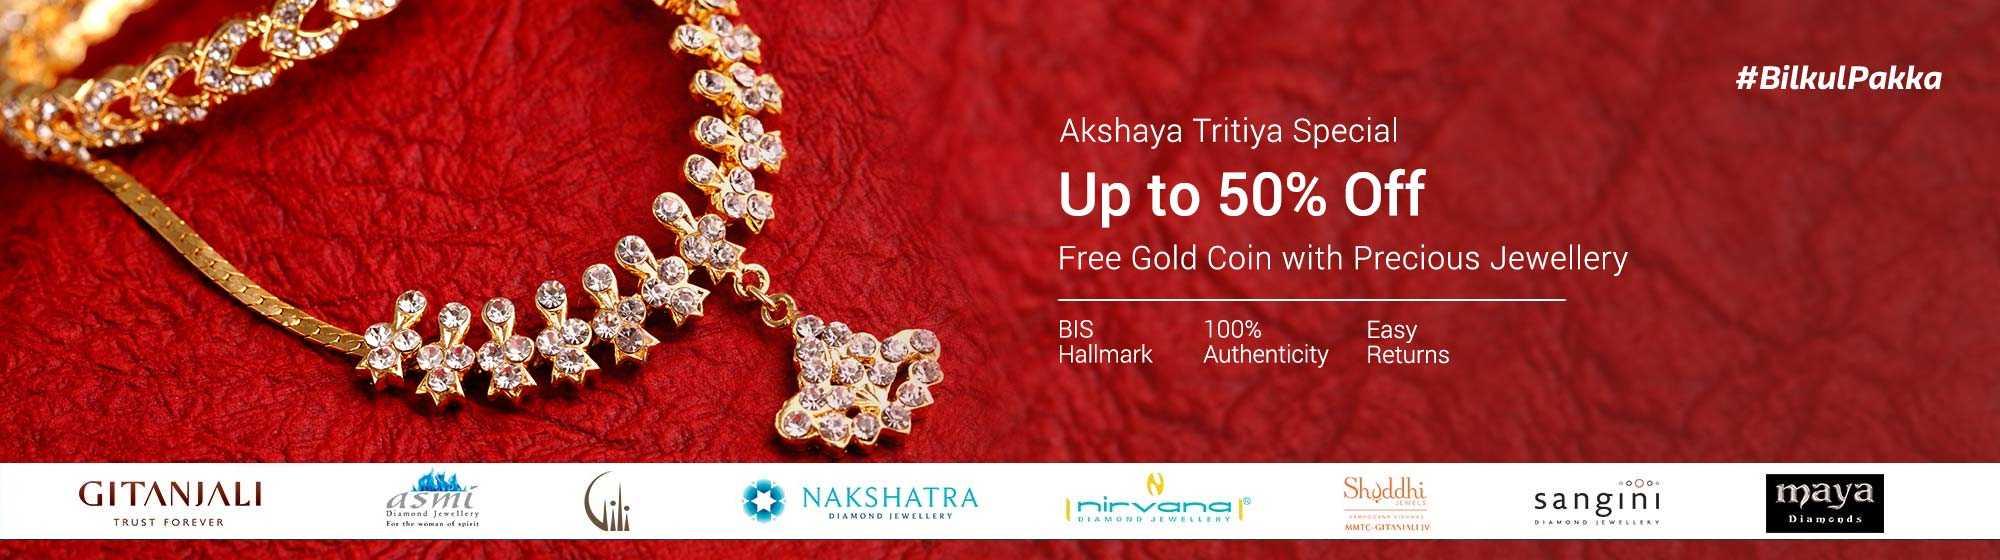 Akshaya Tritiya Offers - Flipkart